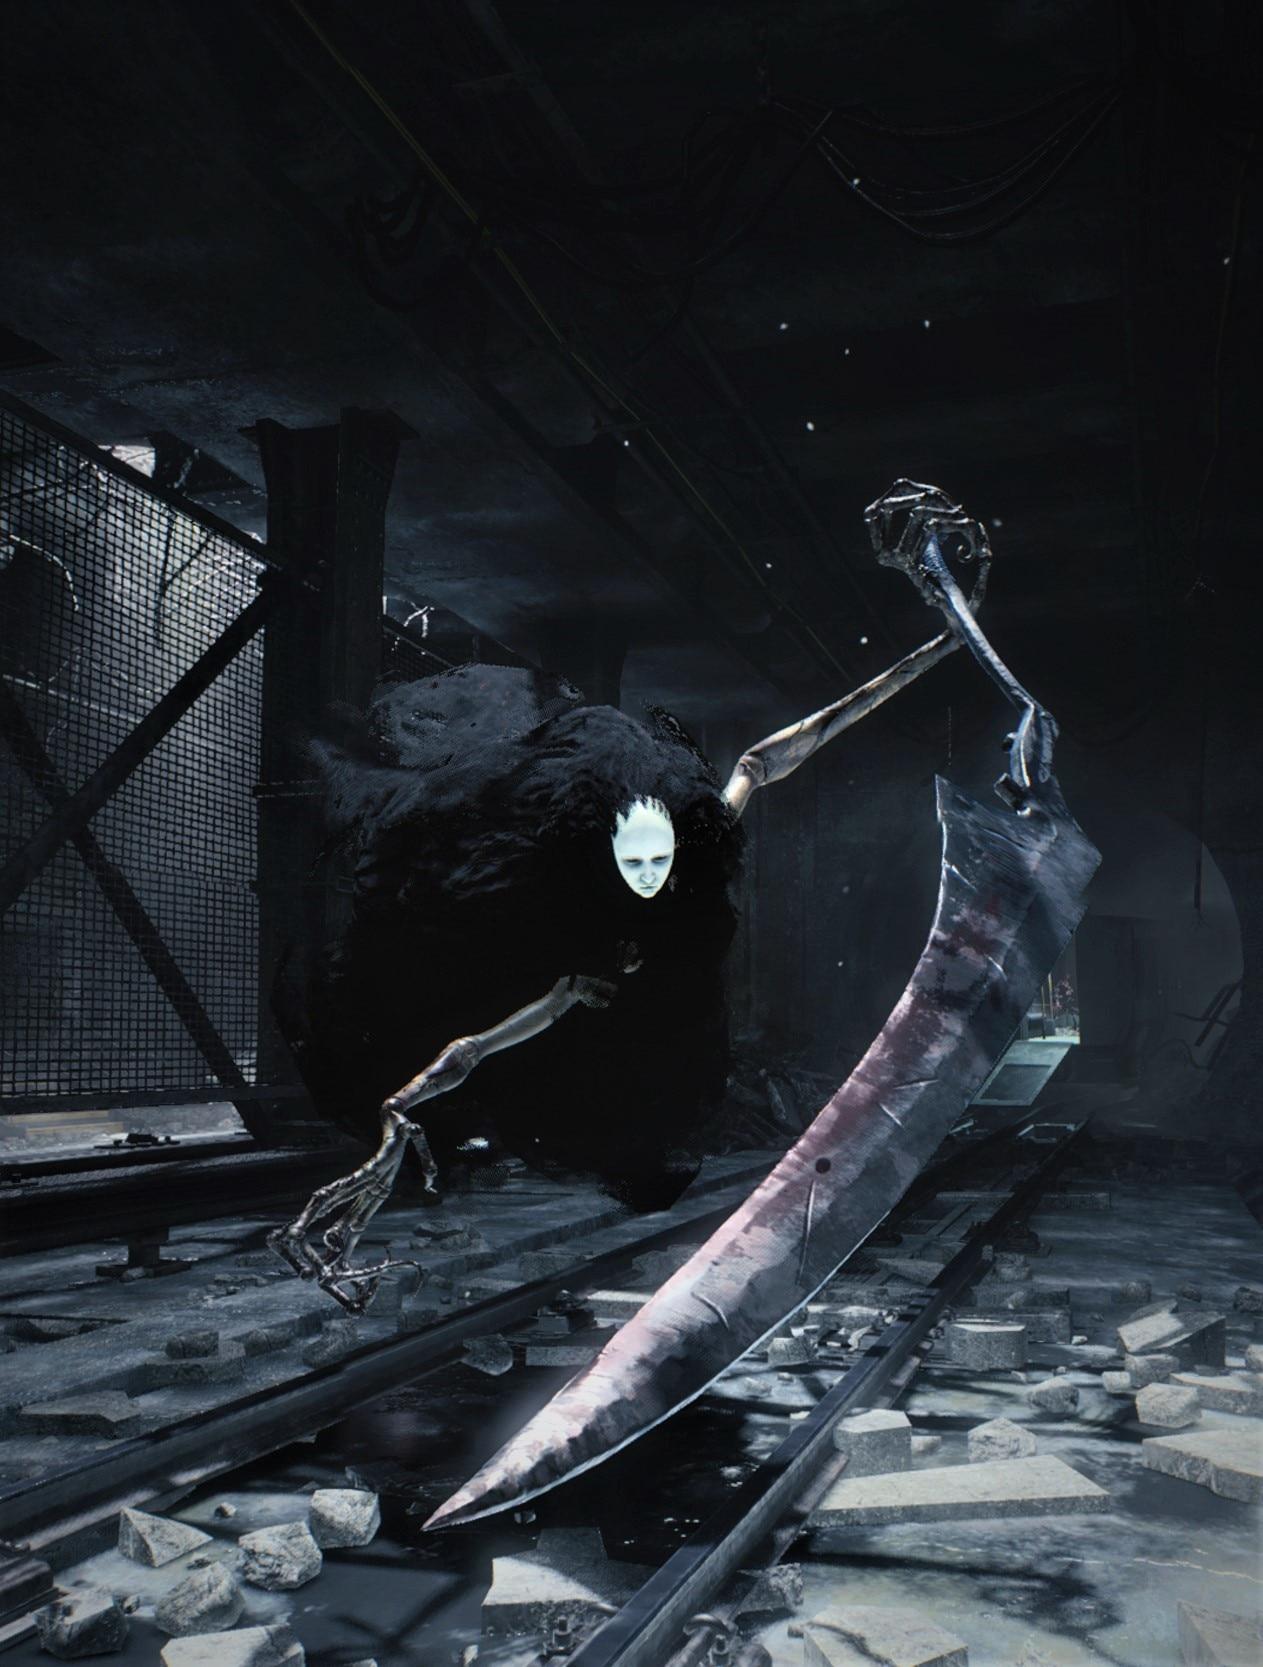 dsgfbvg.jpg - Devil May Cry 5